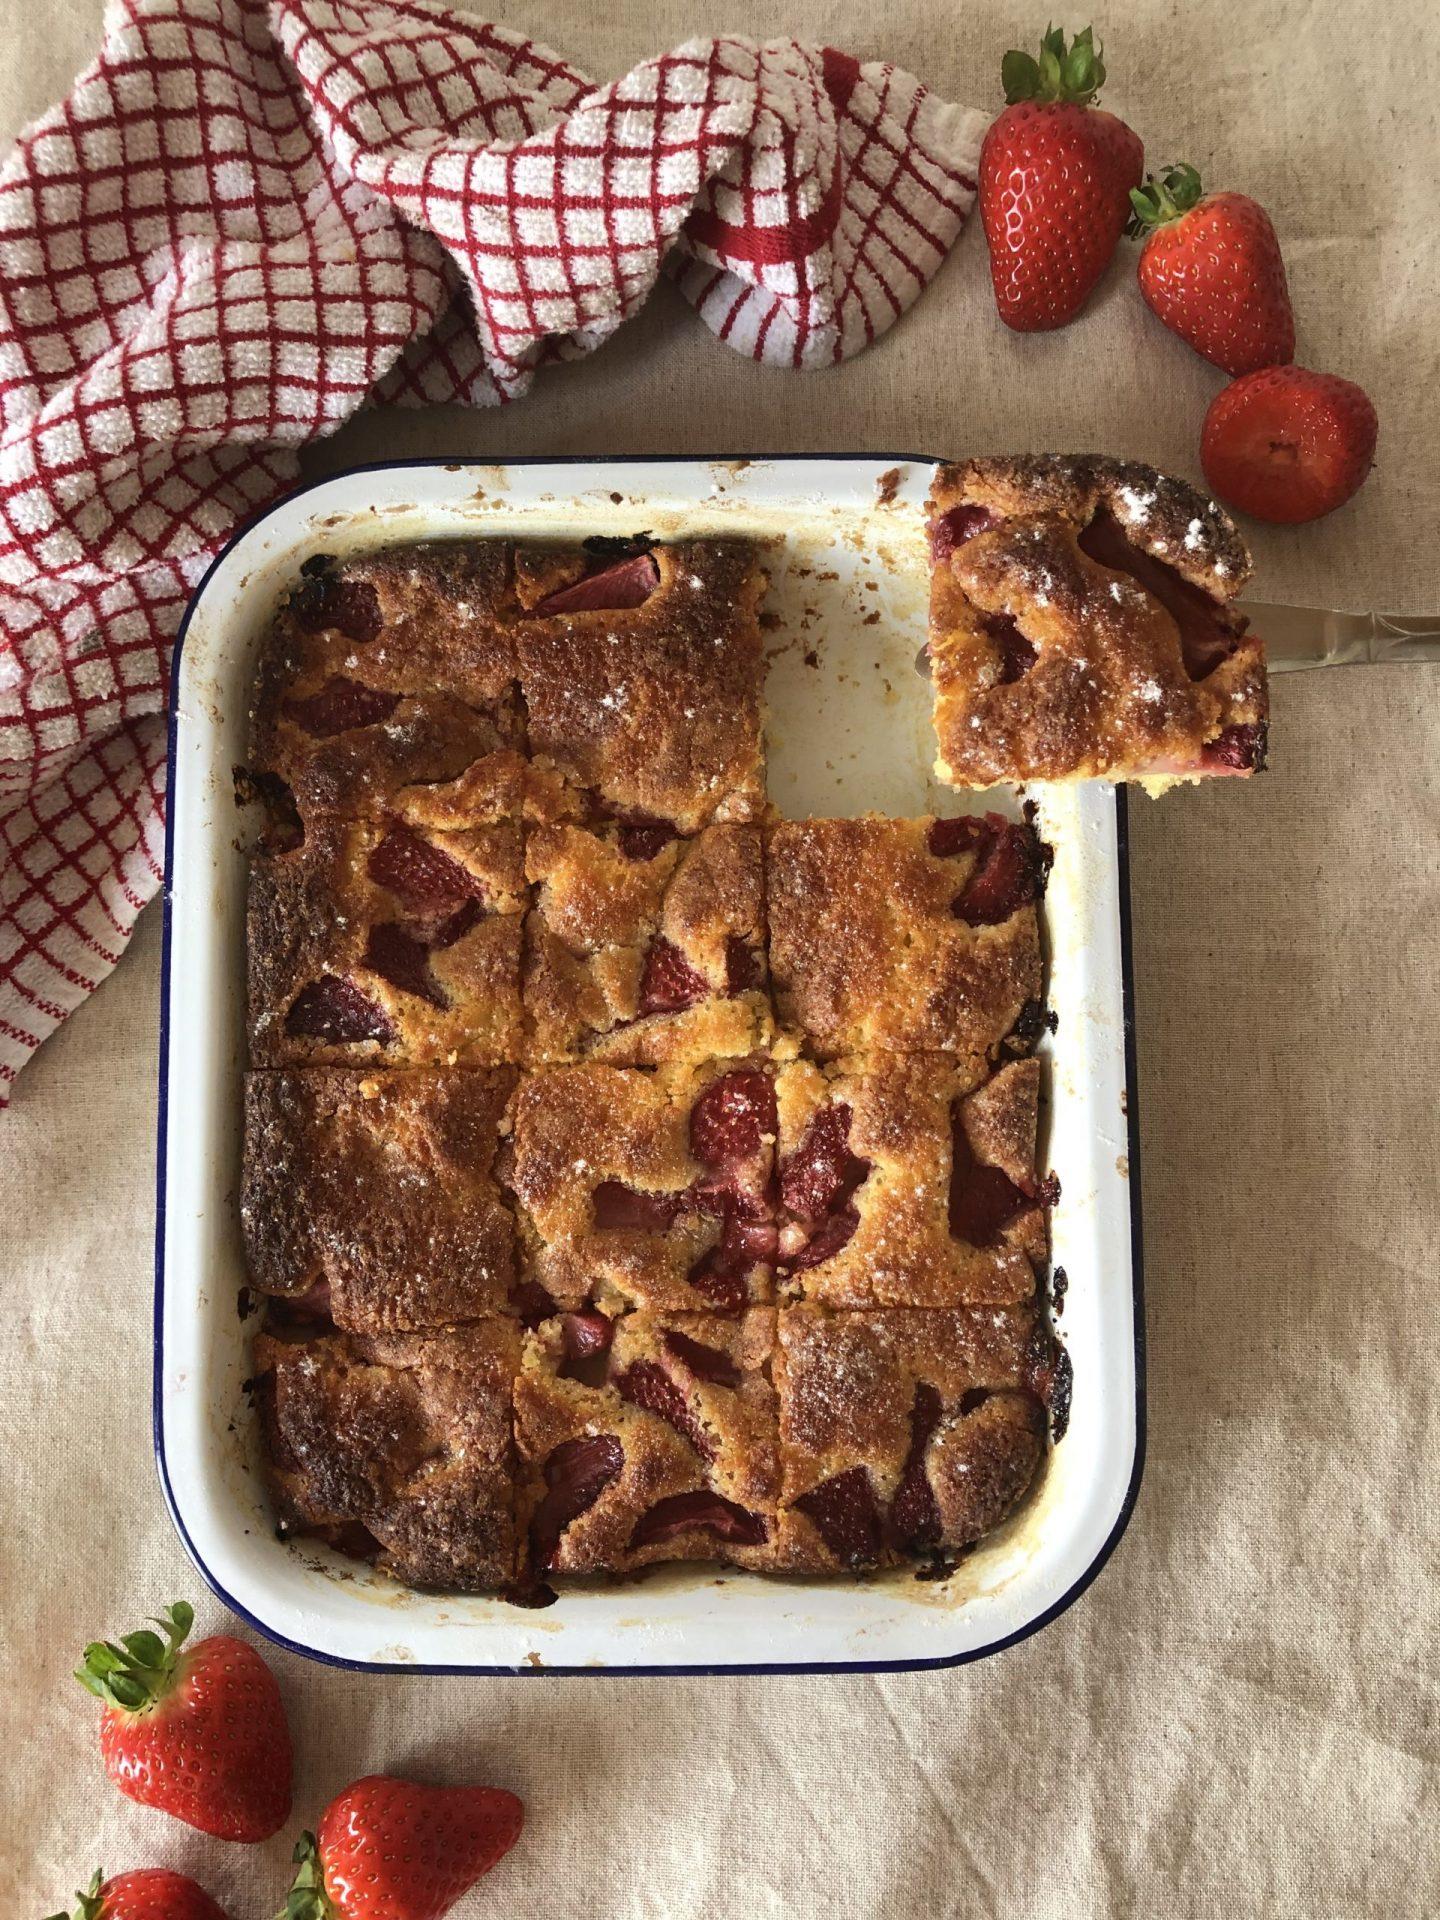 strawberry french cake